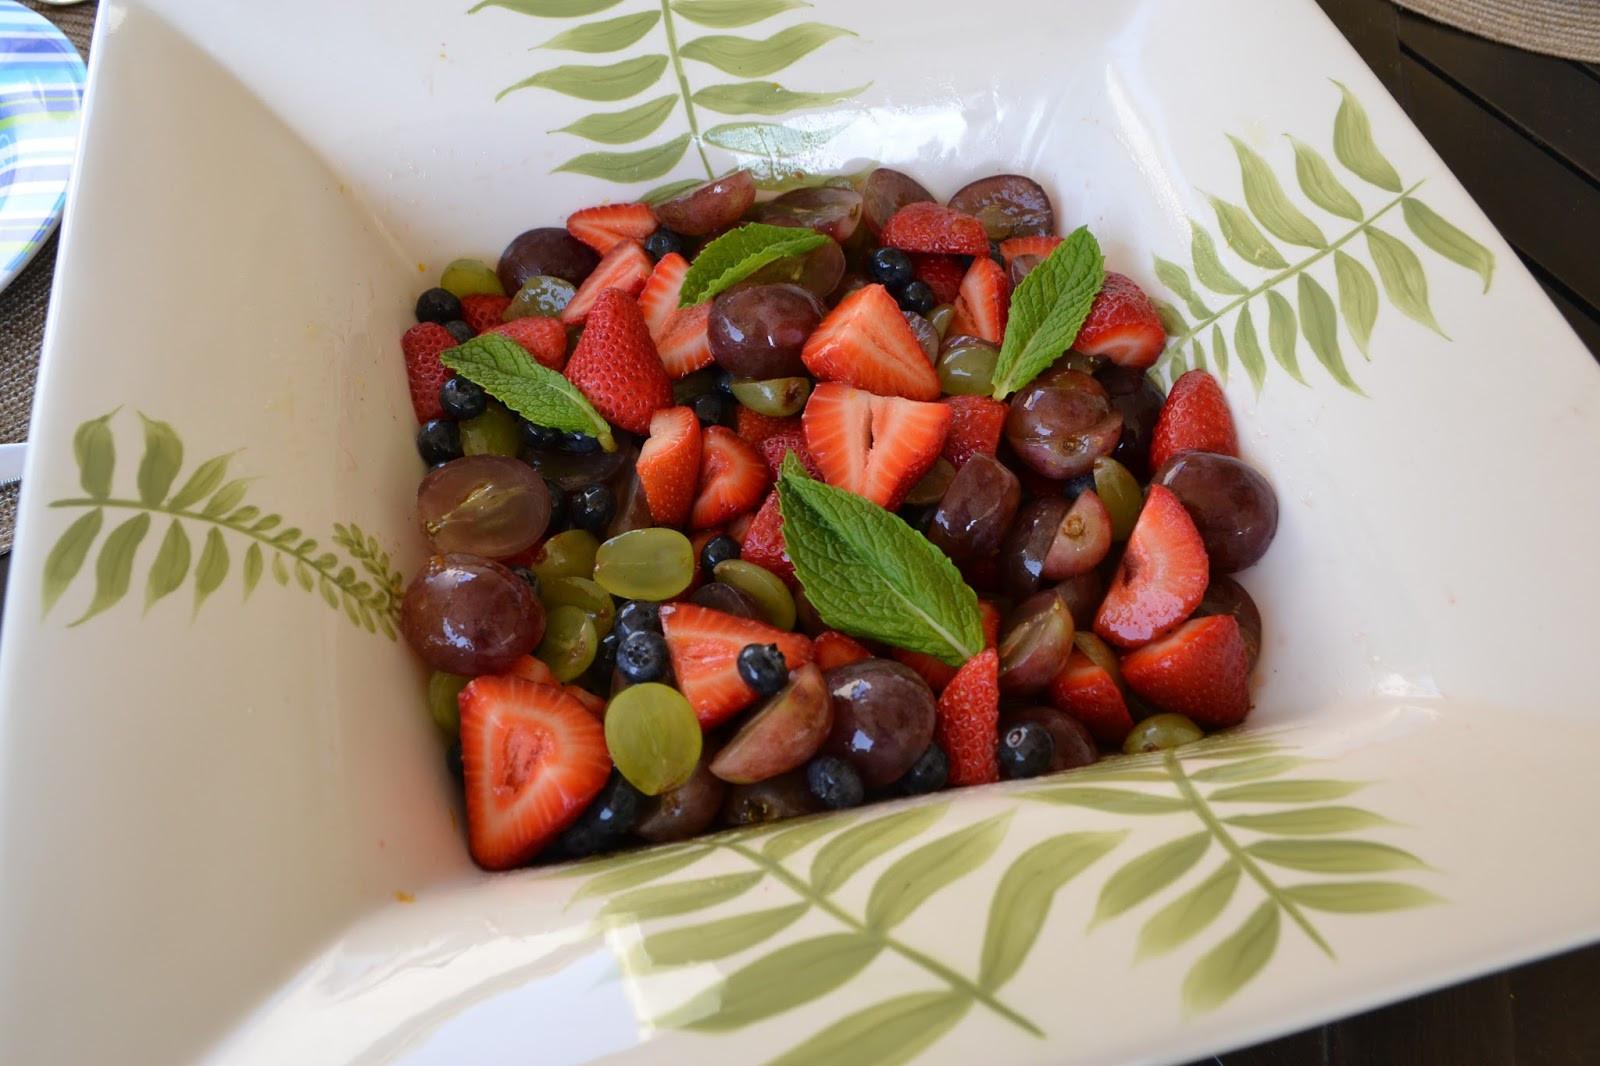 Fruit Salad For Easter Dinner  Plan to Happy Recipes for Easter Sunday Brunch Menu Plan